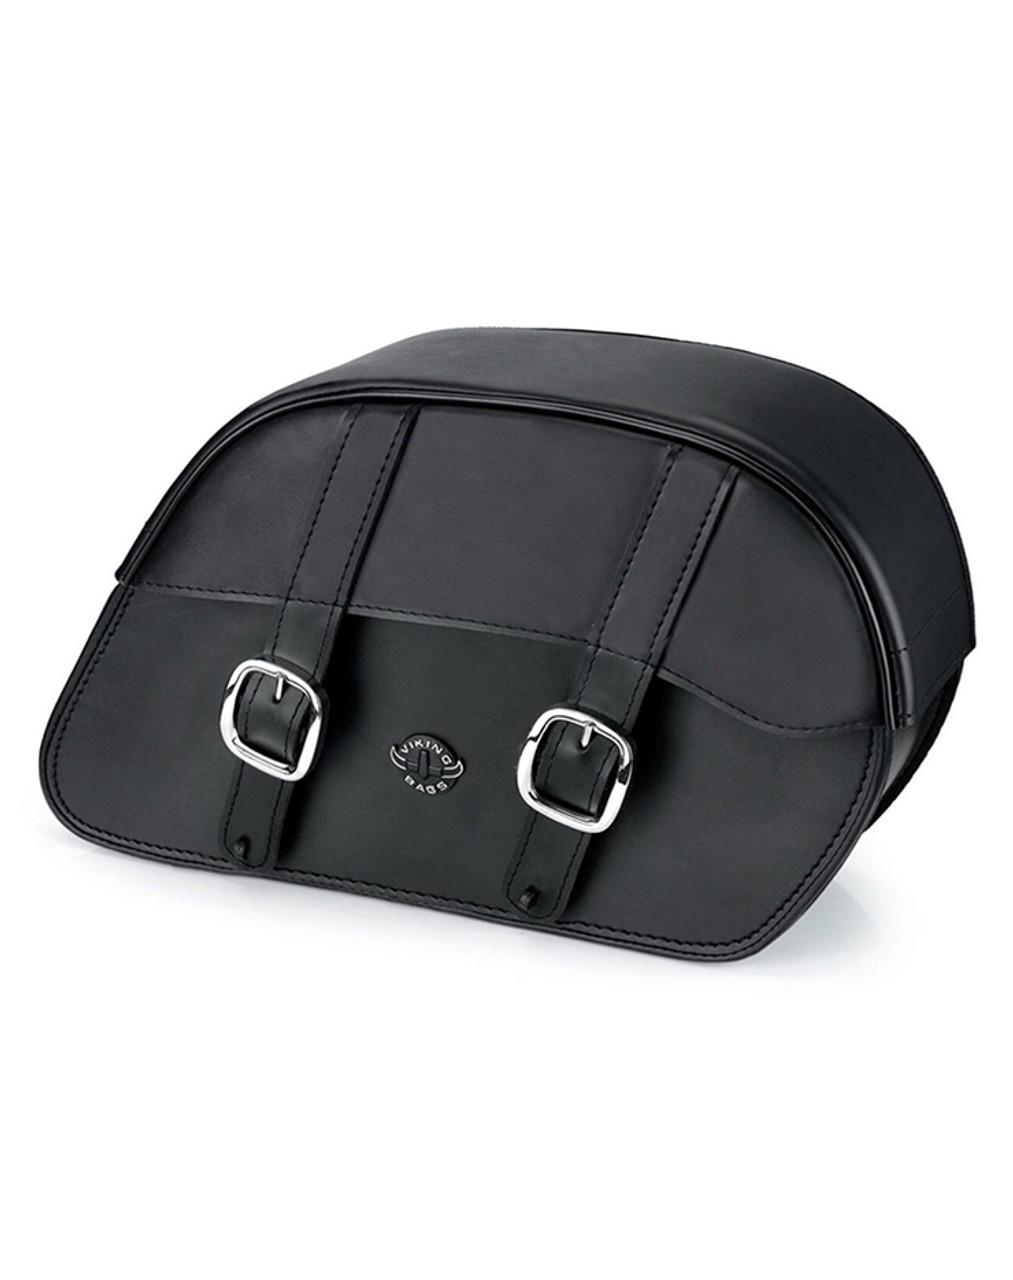 Honda 1500 Valkyrie Standard Slanted L Motorcycle saddlebags Main Bag View